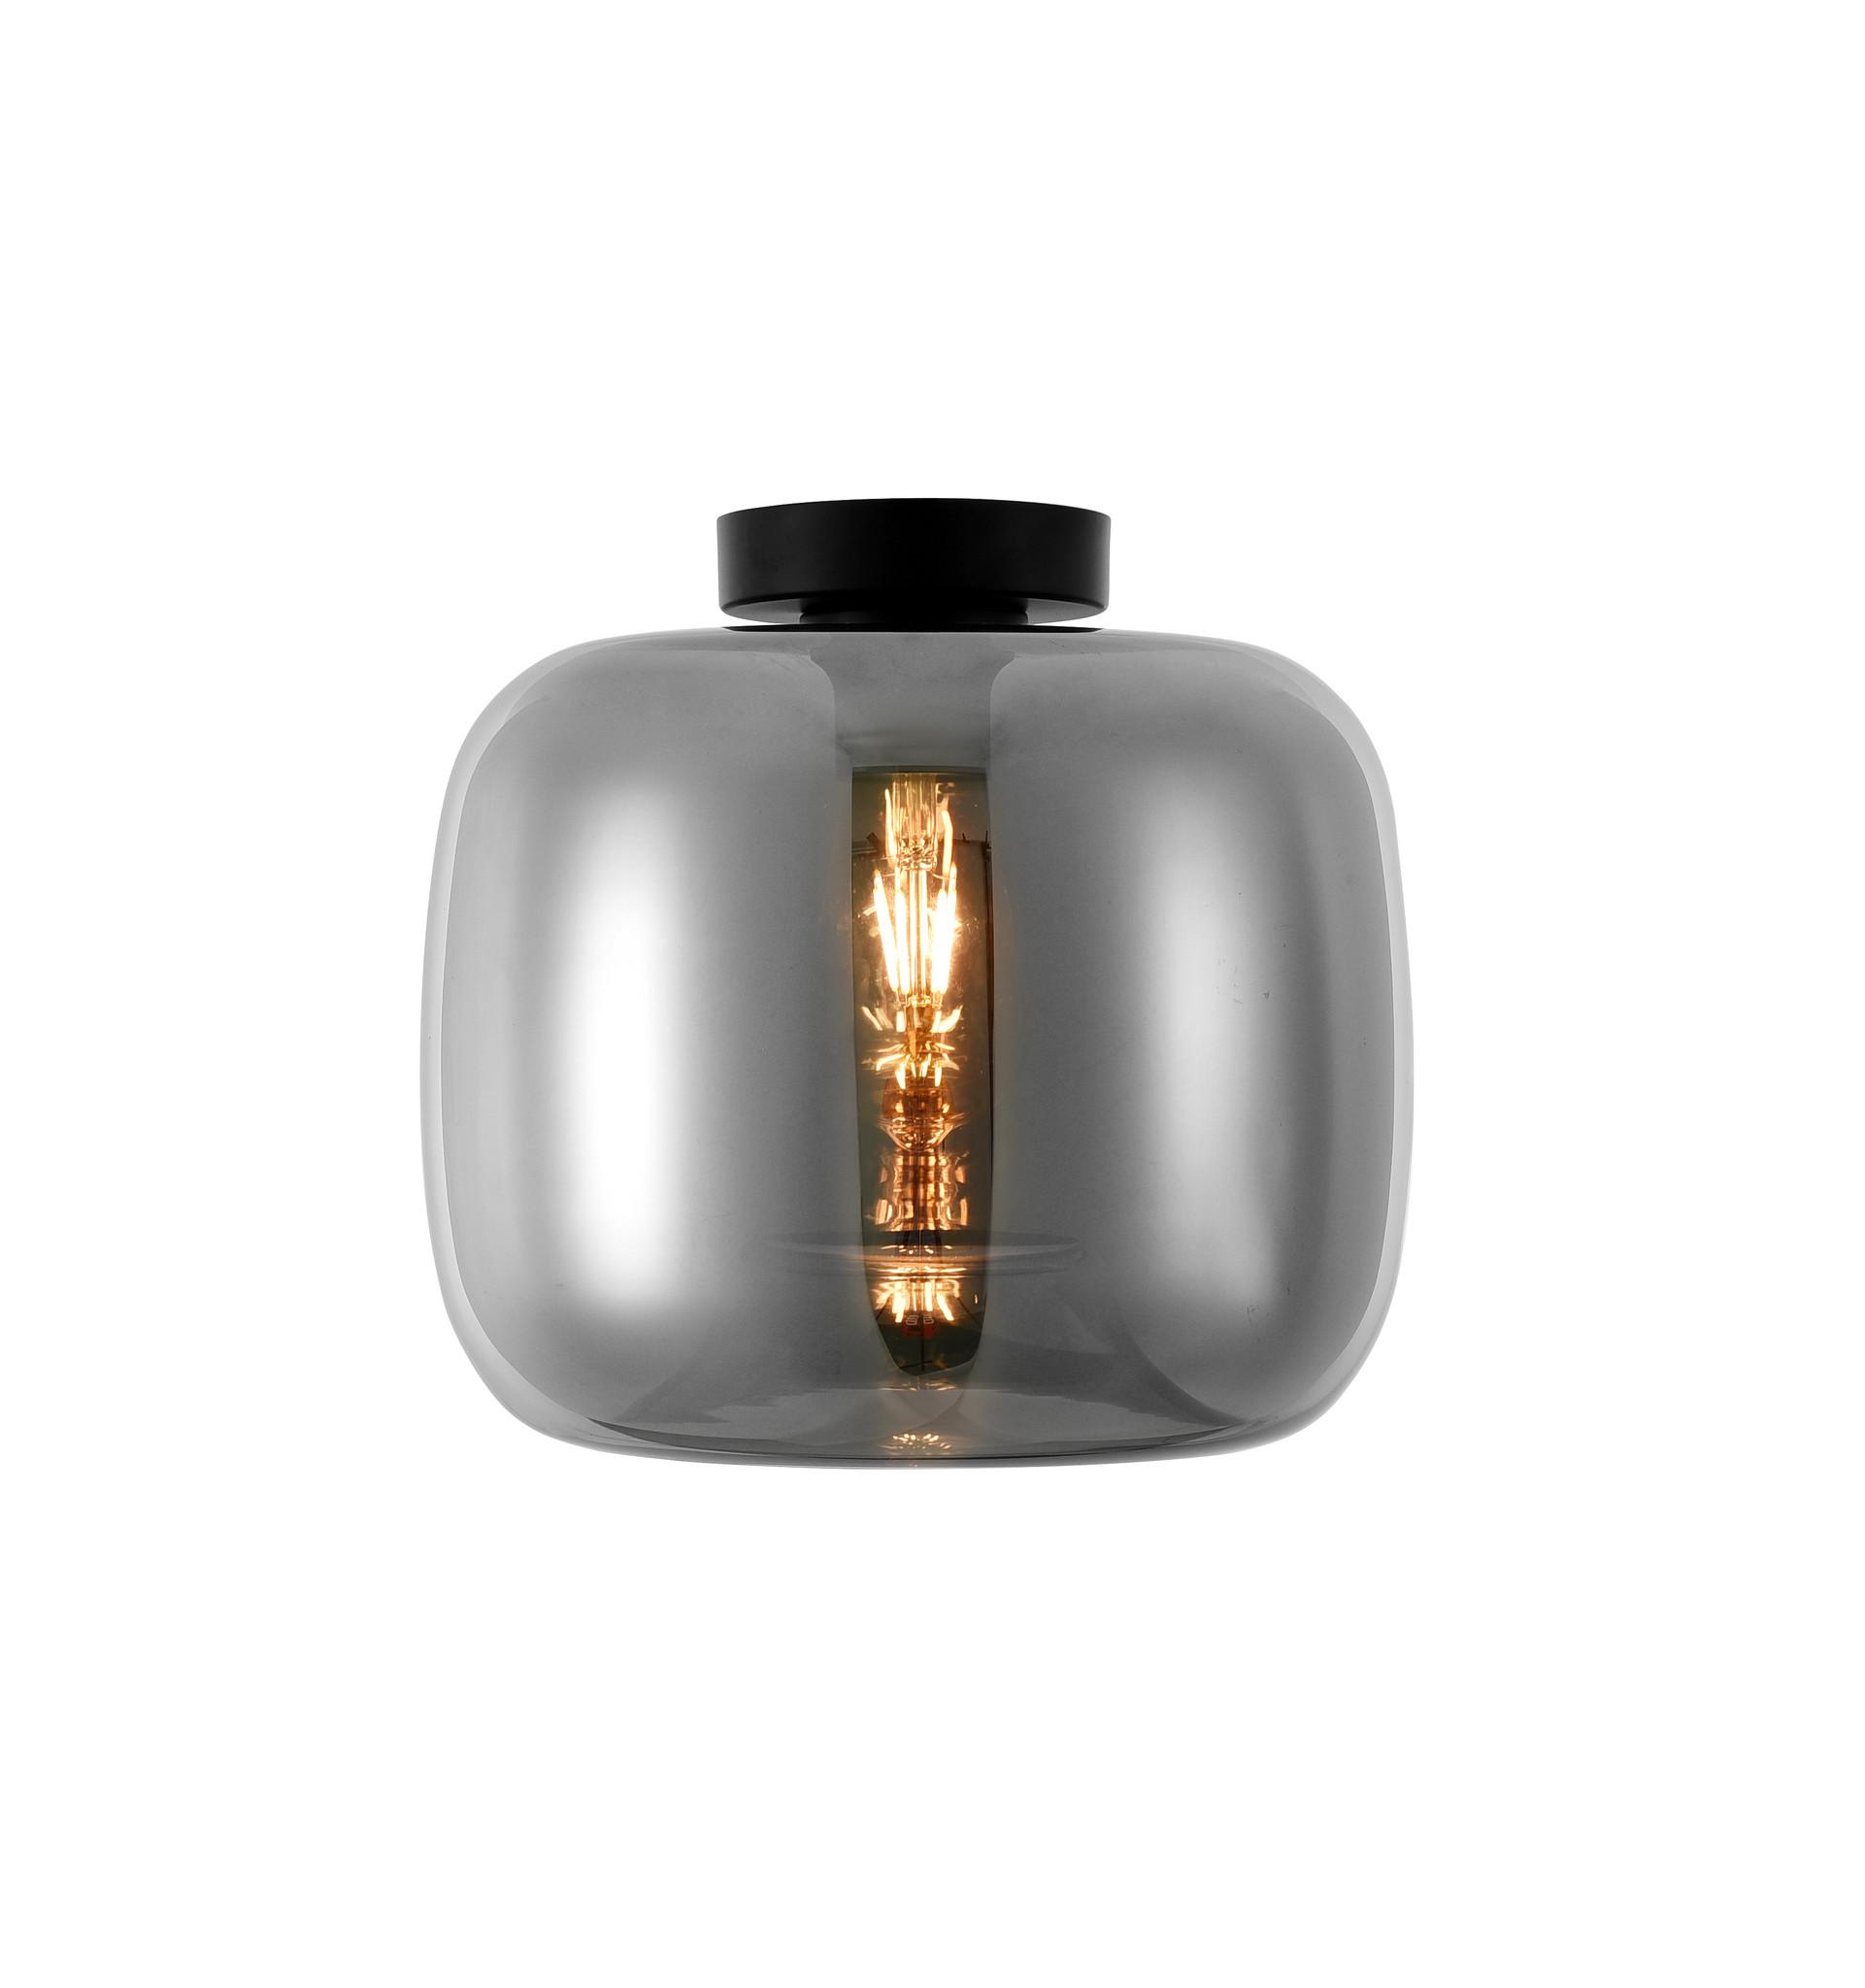 Artdelight Plafondlamp Preston Zwart & Smoke Glas 28cm   Artdelight   8719831735785